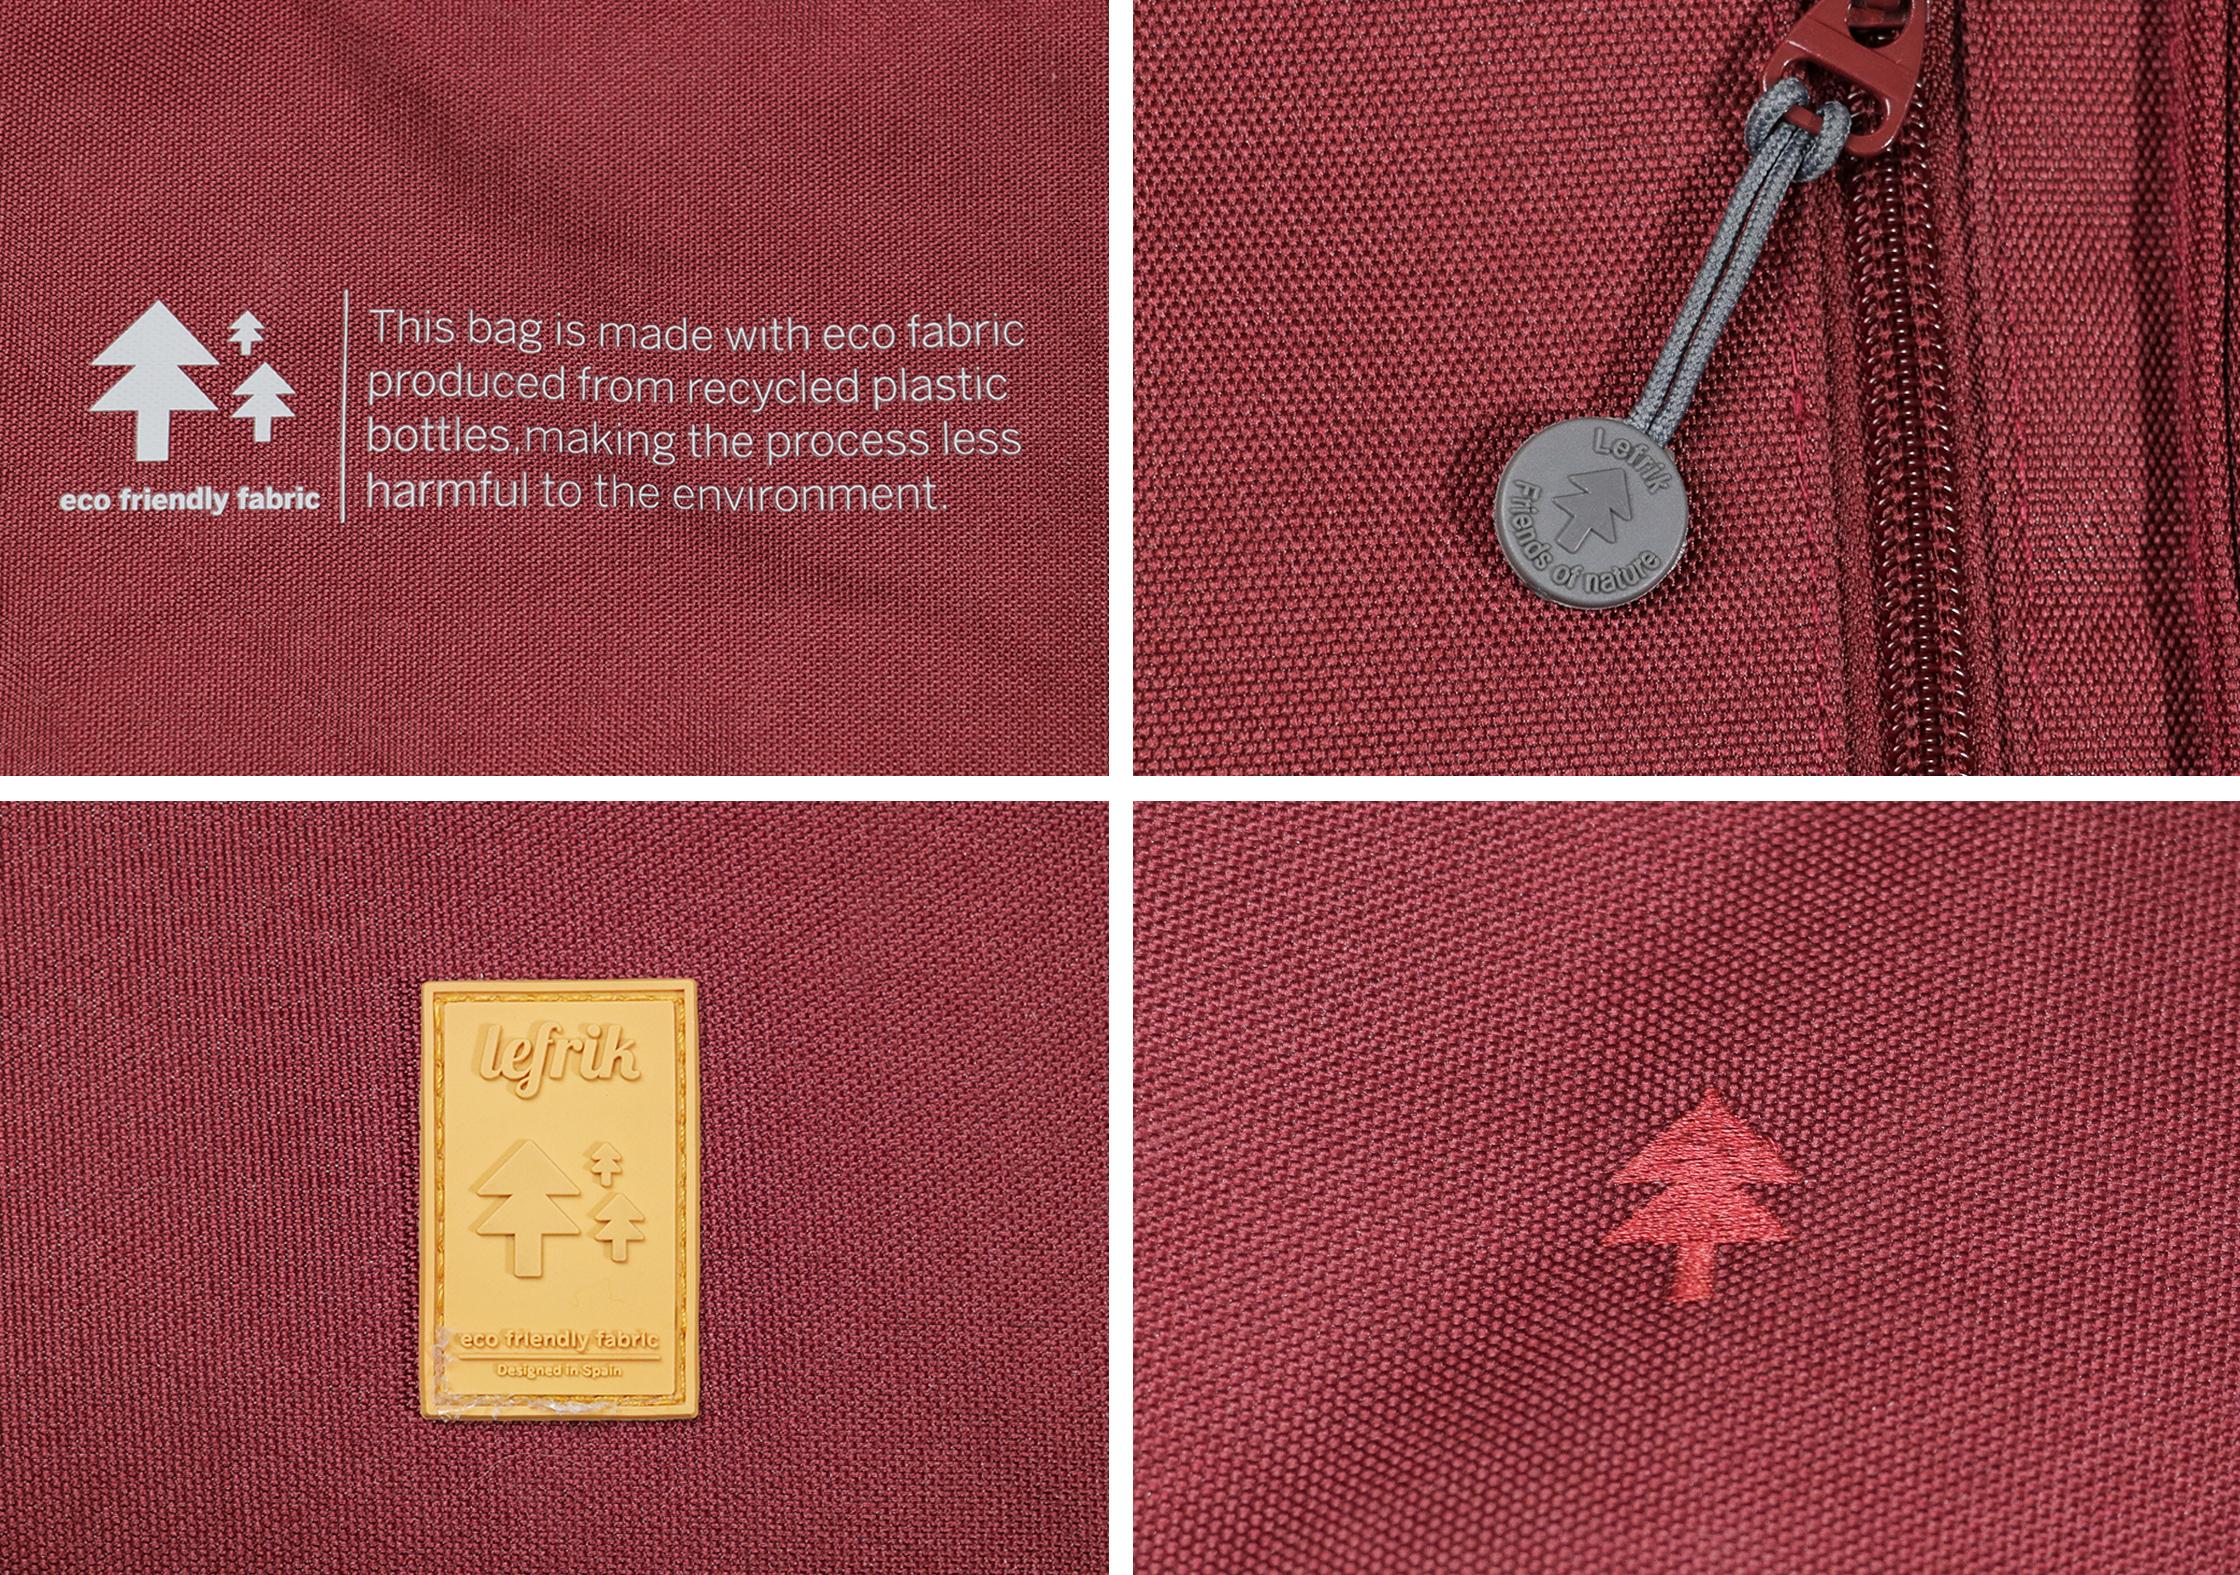 Lefrik Handy Backpack Branding